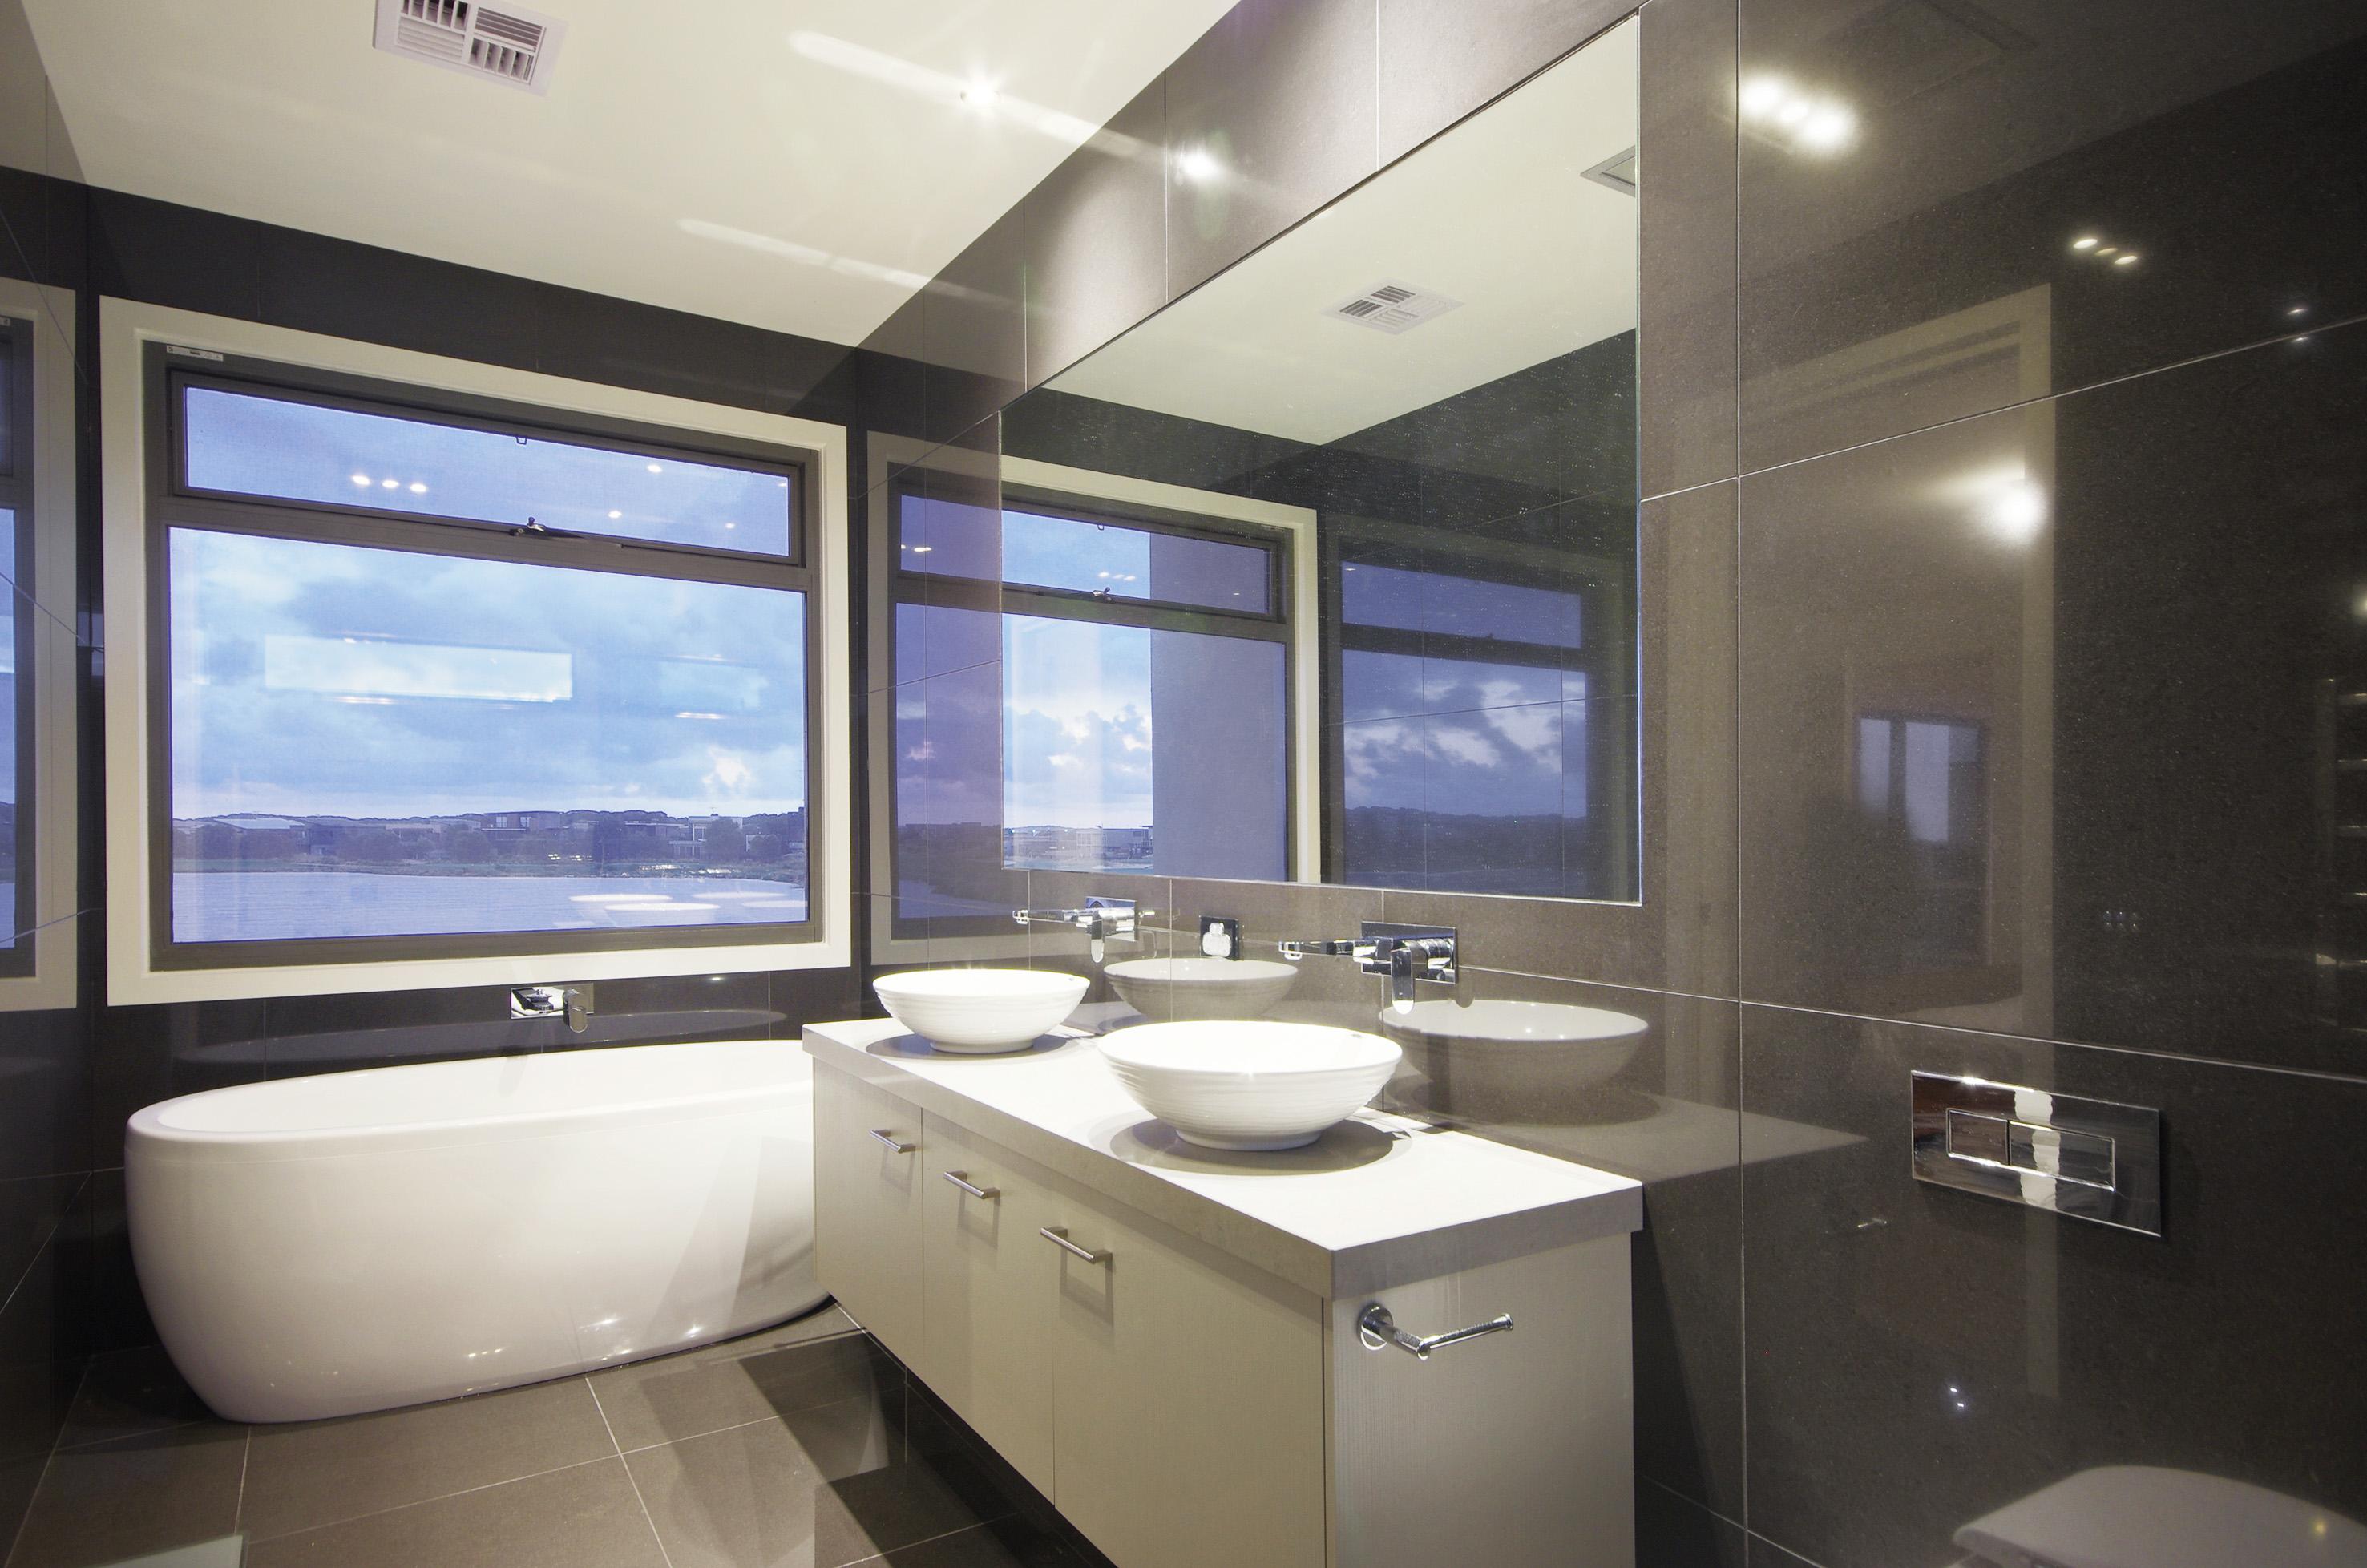 1 Freestanding bath